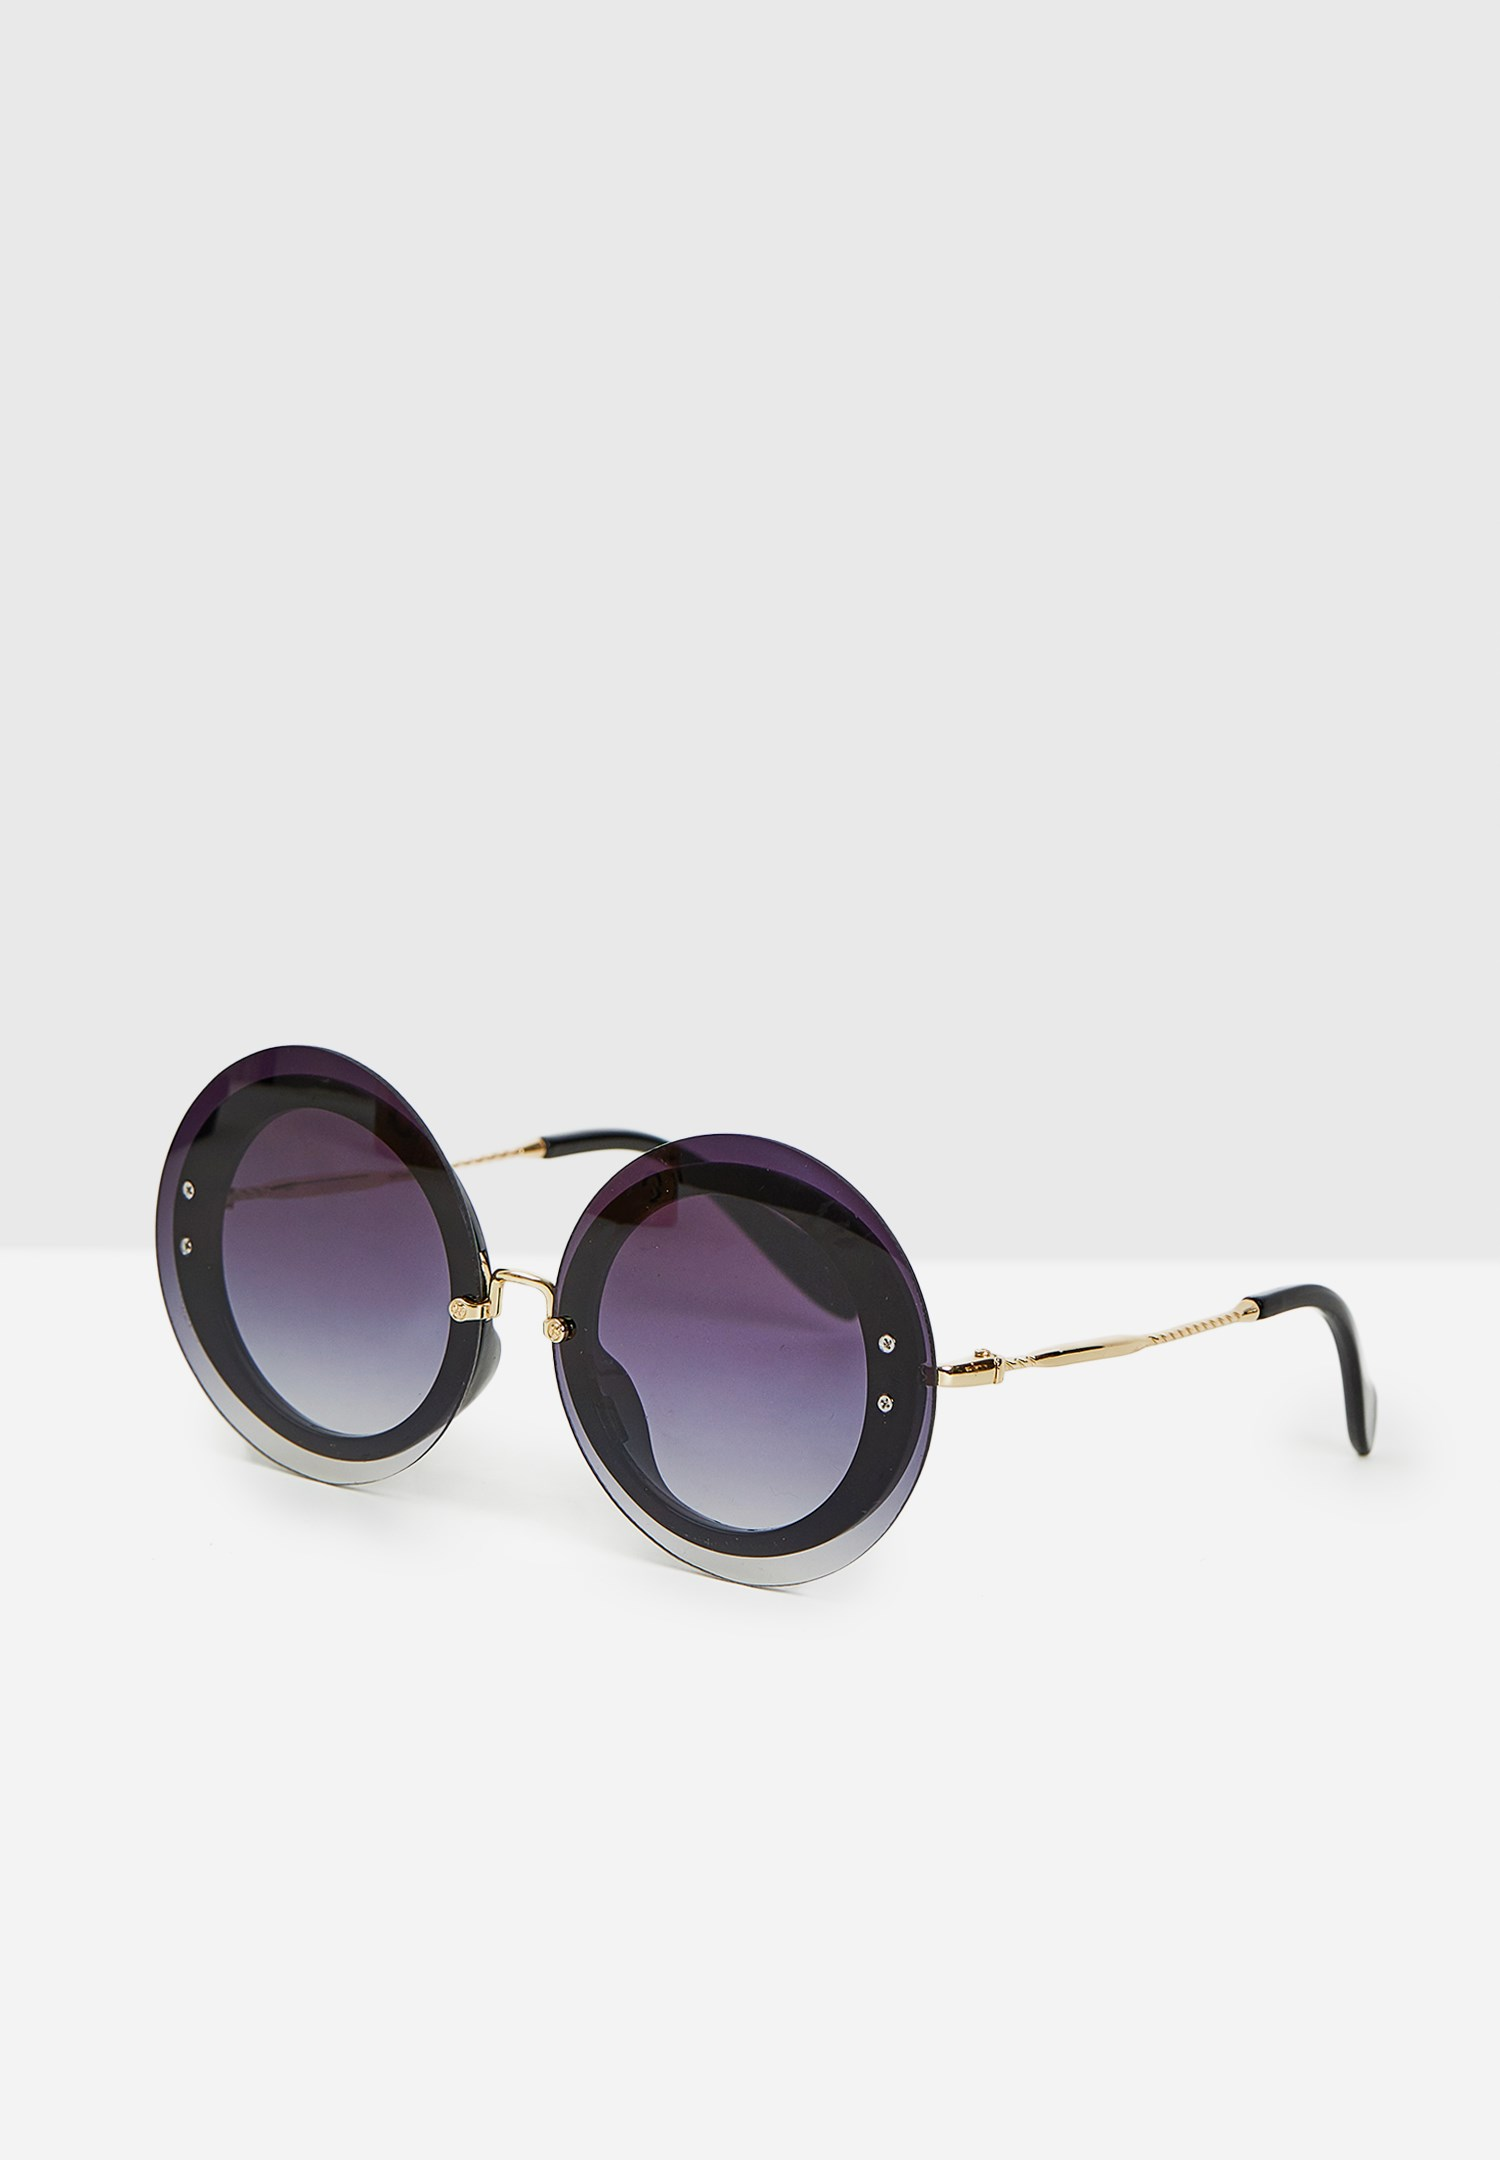 Bayan Siyah Yuvarlak Gold Detaylı Gözlük